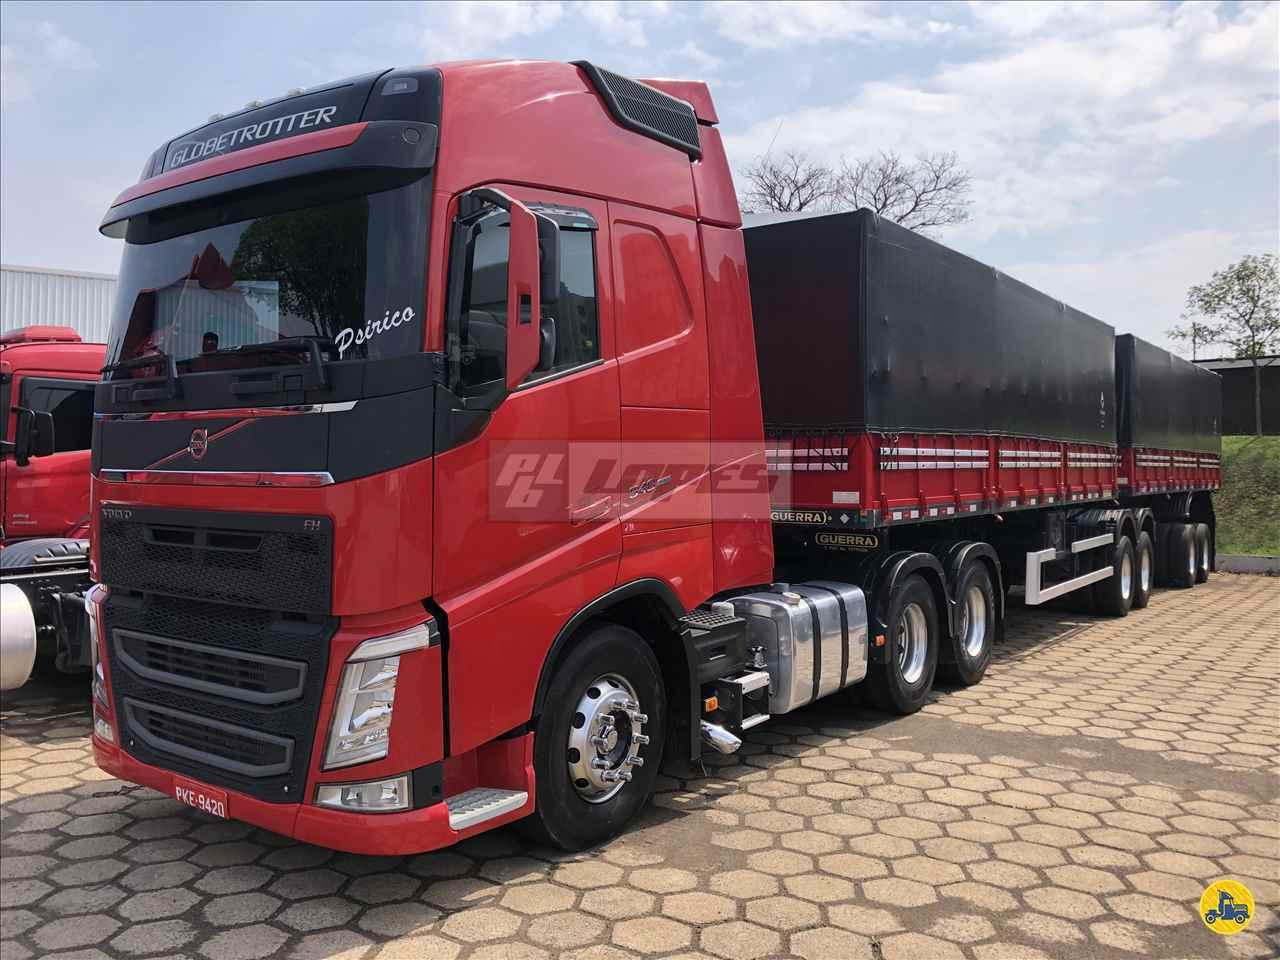 VOLVO FH 540 de P.B. Lopes - Scania - MARINGA/PR